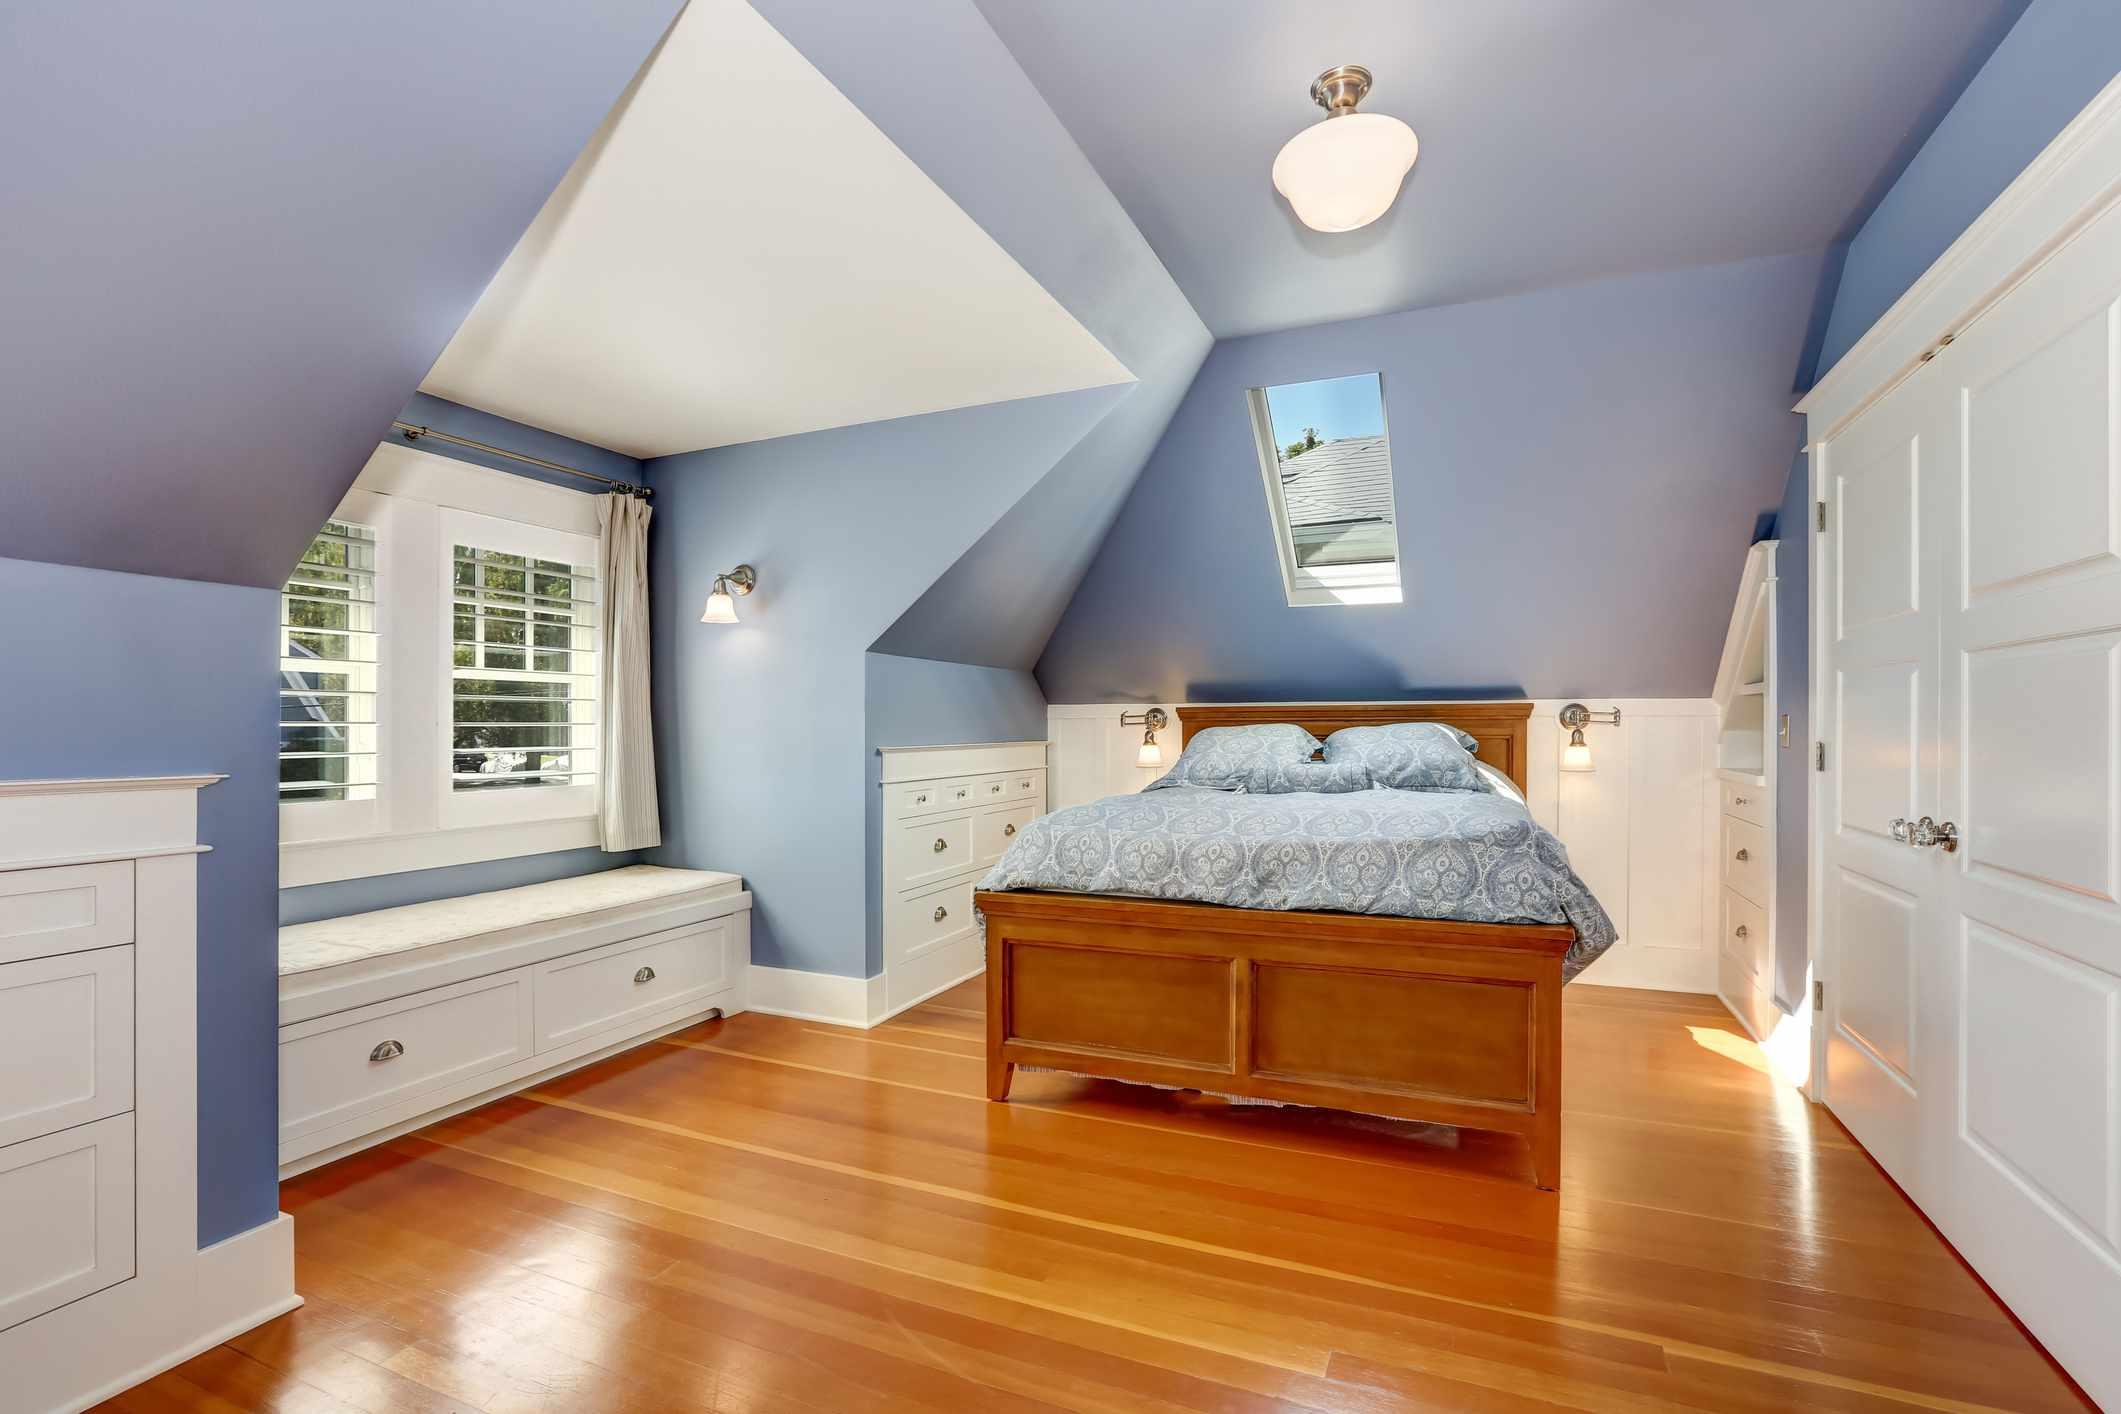 Furnished attic